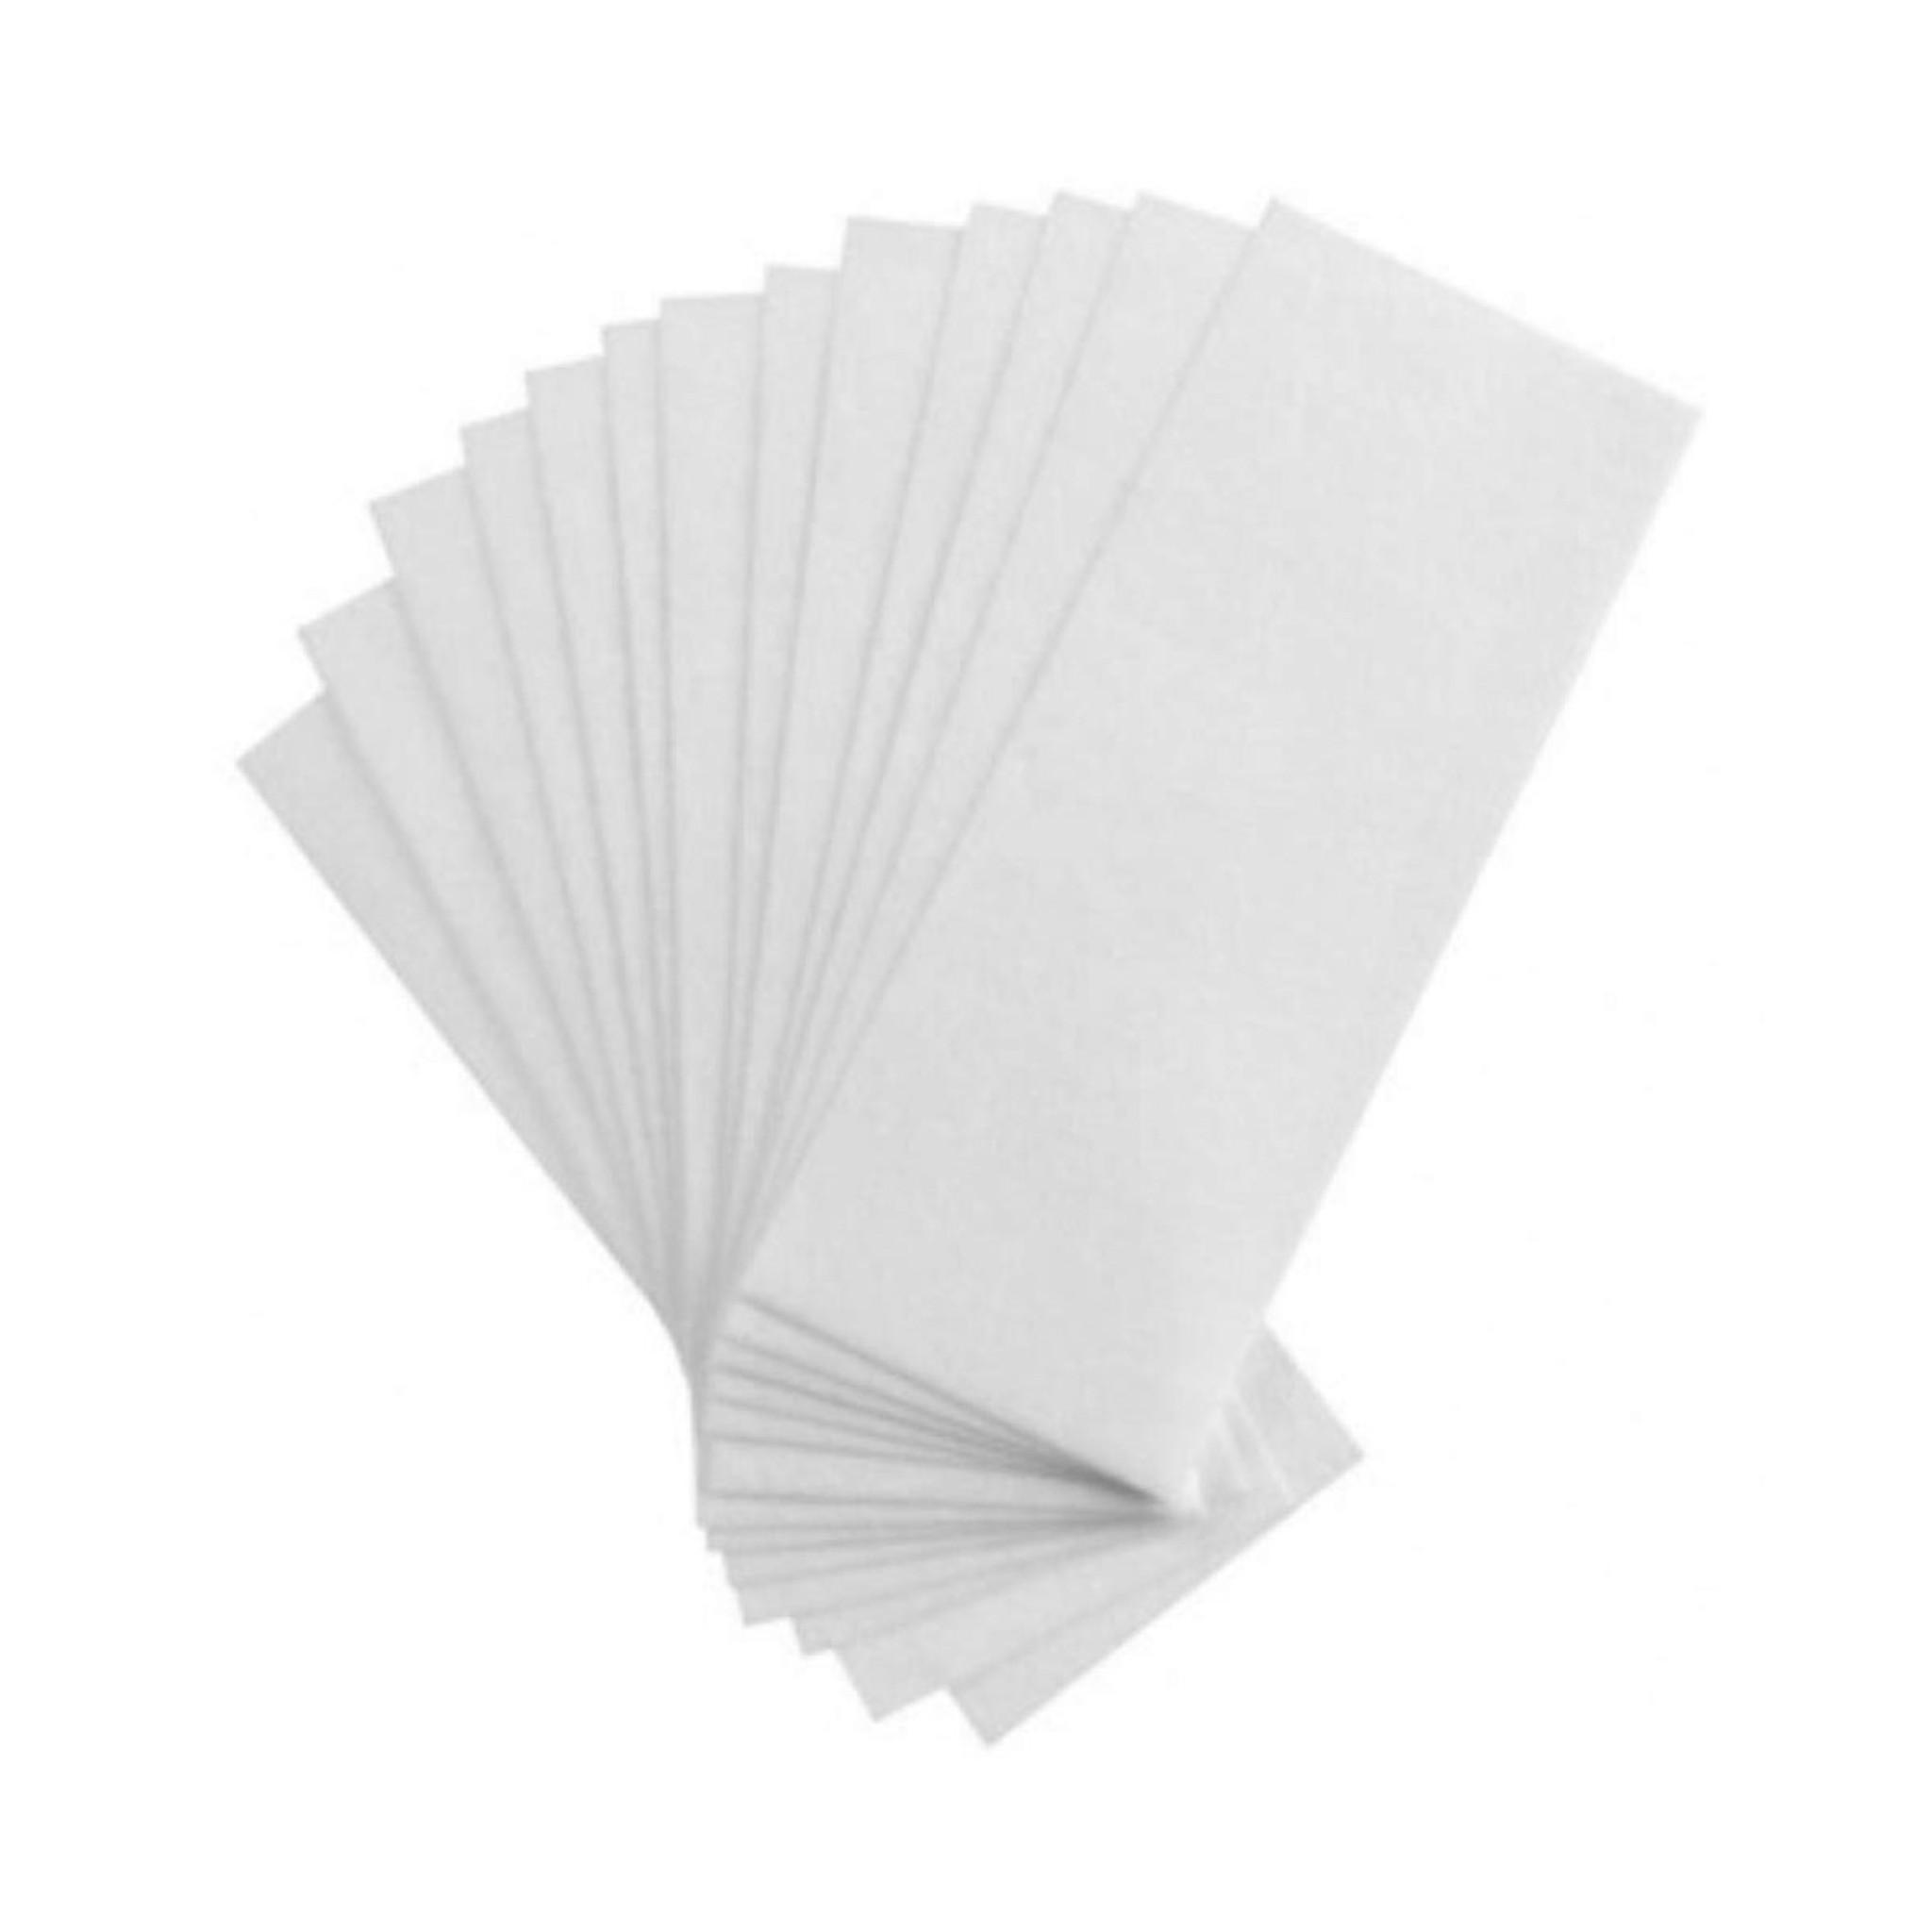 Wax Paper (100 pre-cut strips)